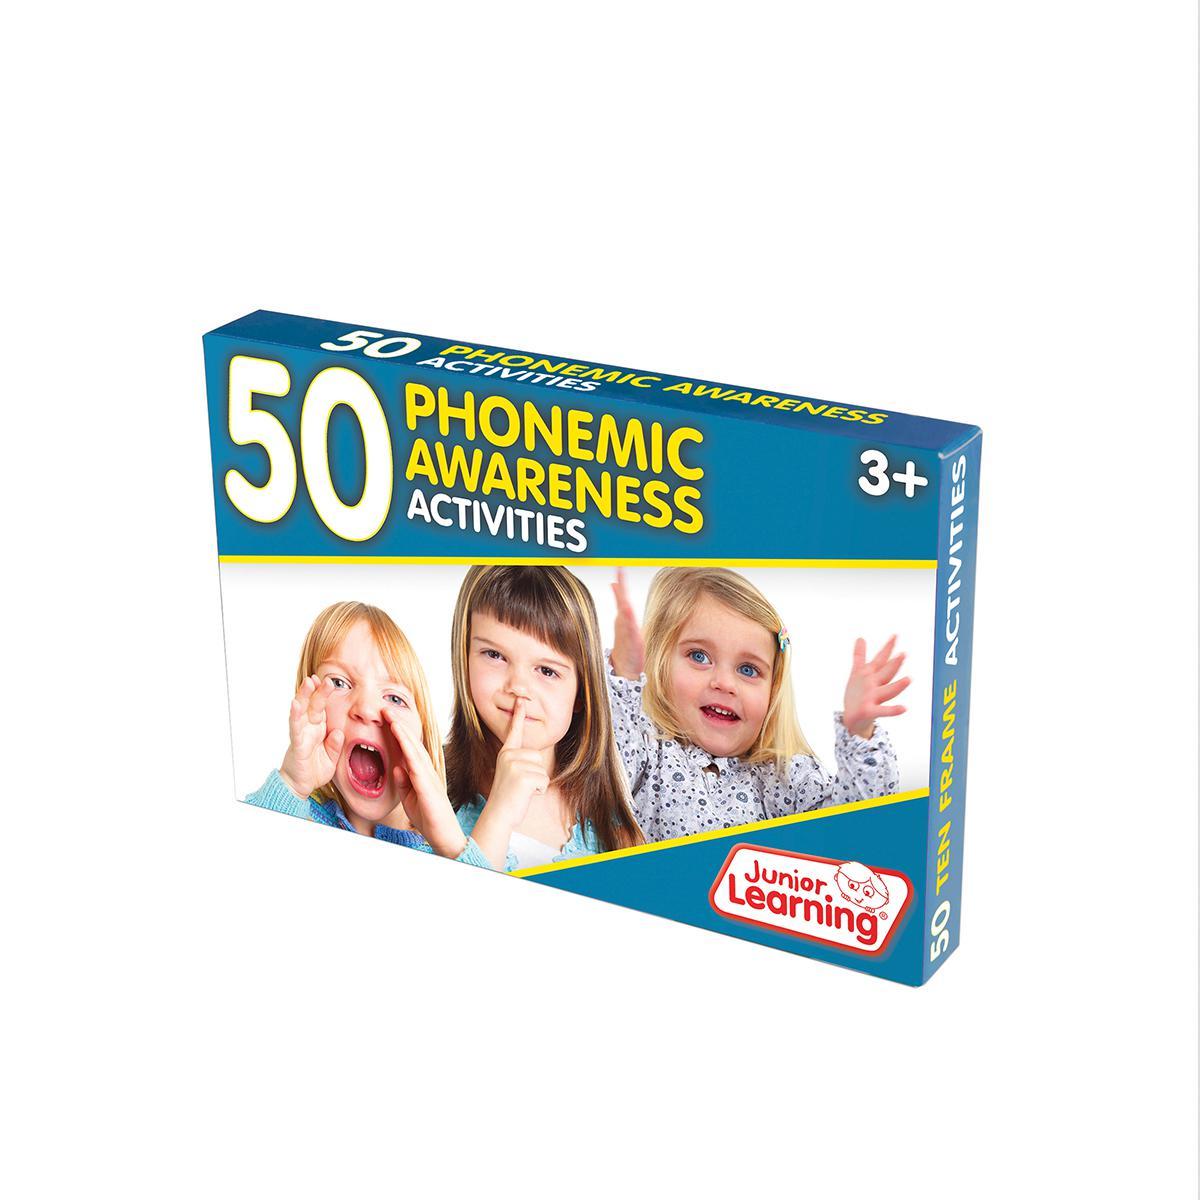 50 Phonemic Awareness Activities